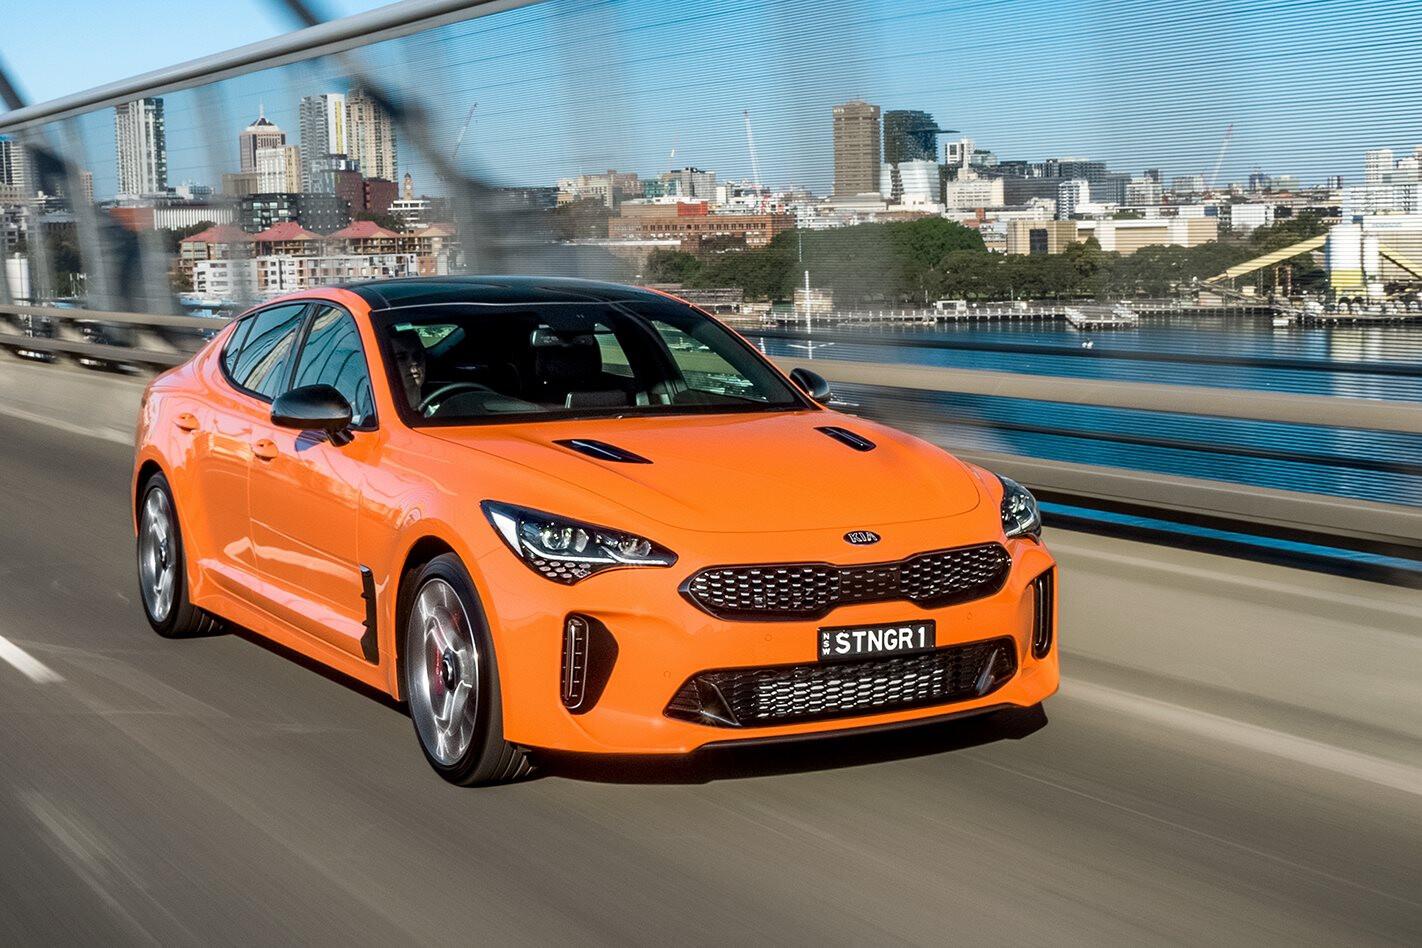 2020 Kia Stinger GT review